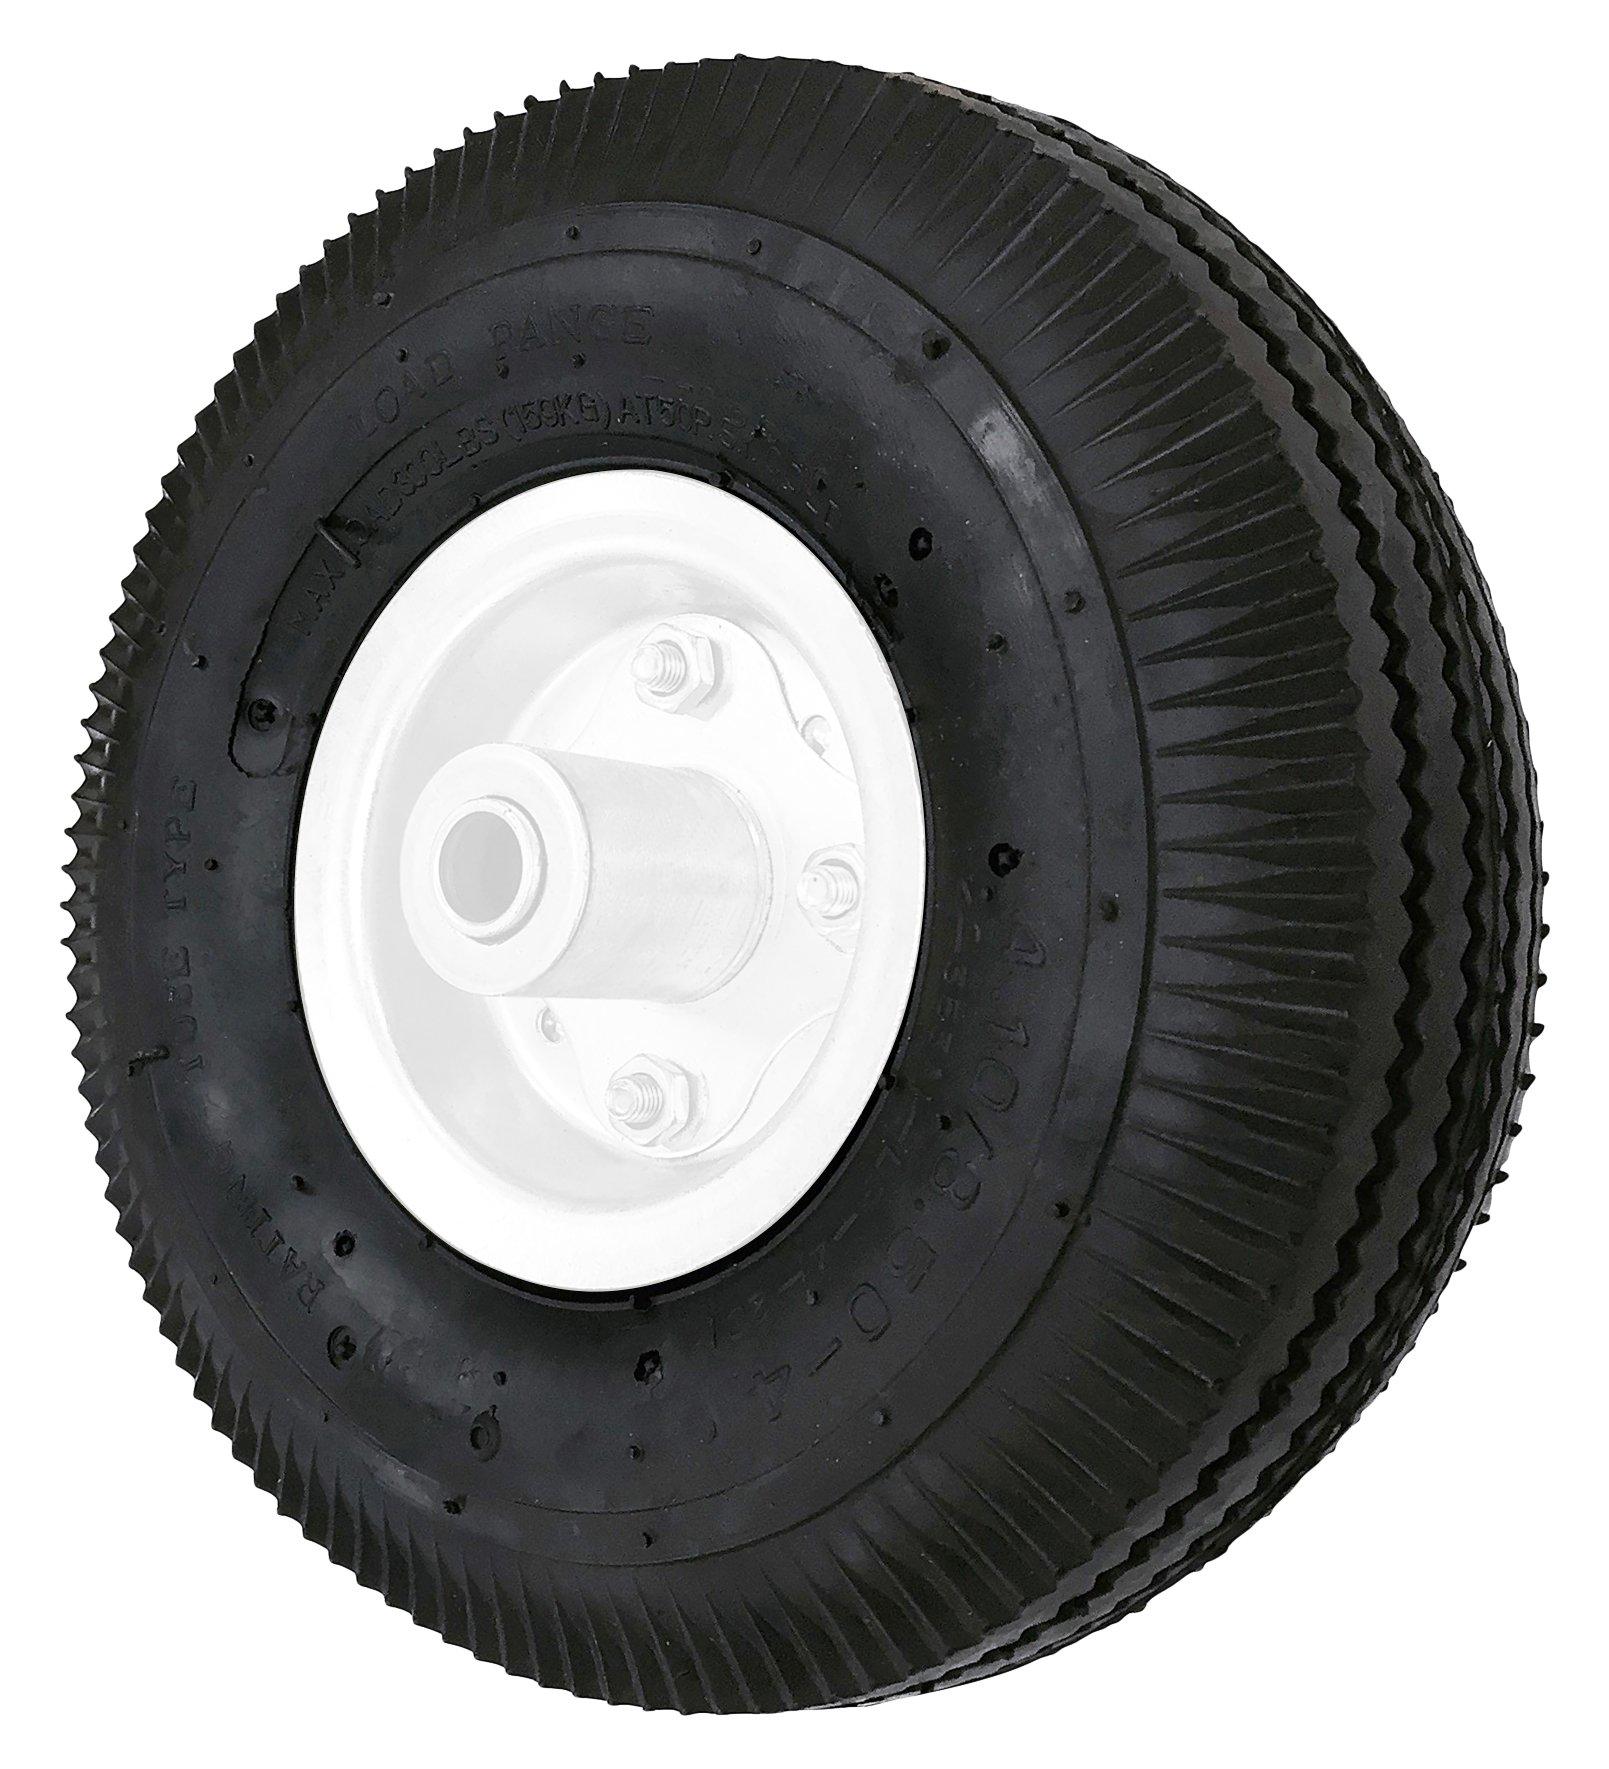 Shepherd Hardware 9634 4.10x10-Inch Pneumatic Replacement Tire, 10-Inch, Sawtooth Tread, 3-1/2-Inch Offset Hub, 5/8-Inch Axle Diameter, Ball Bearings